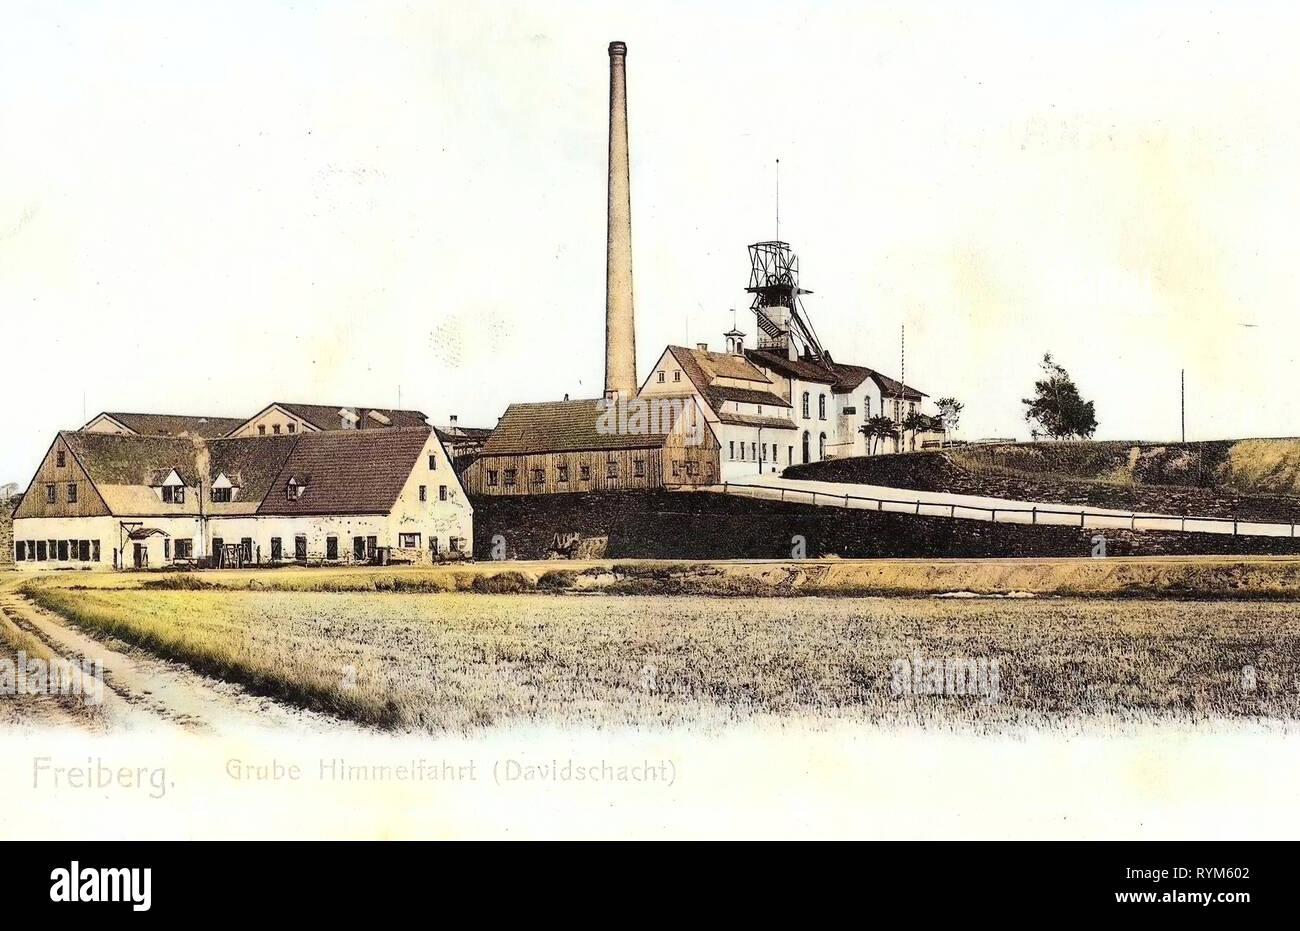 Industry in Saxony, 1903, Landkreis Mittelsachsen, Freiberg, Grube Himmelfahrt, Davidschacht, Germany - Stock Image